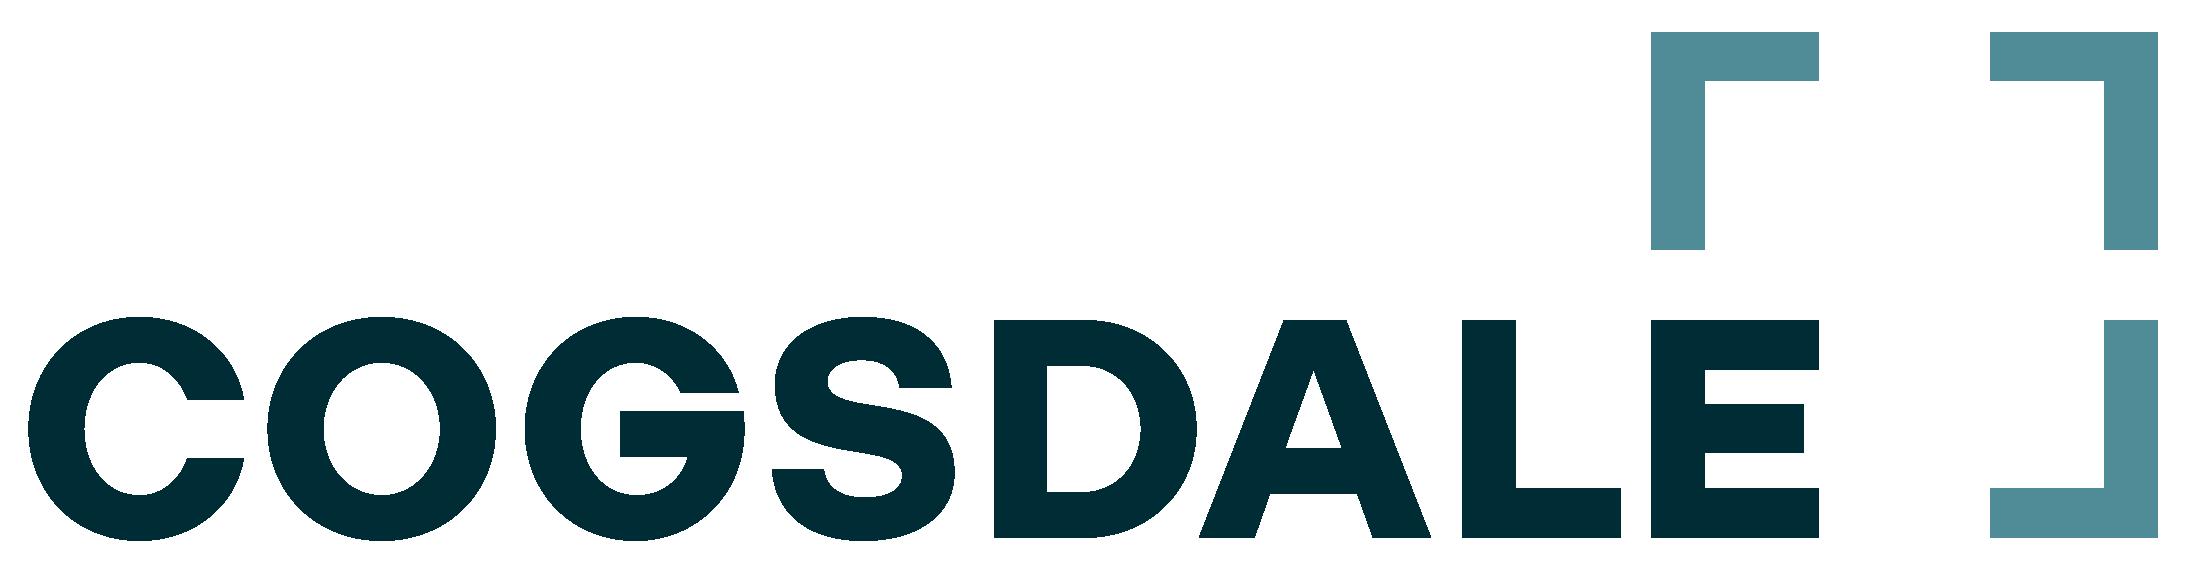 Cogsdale logo